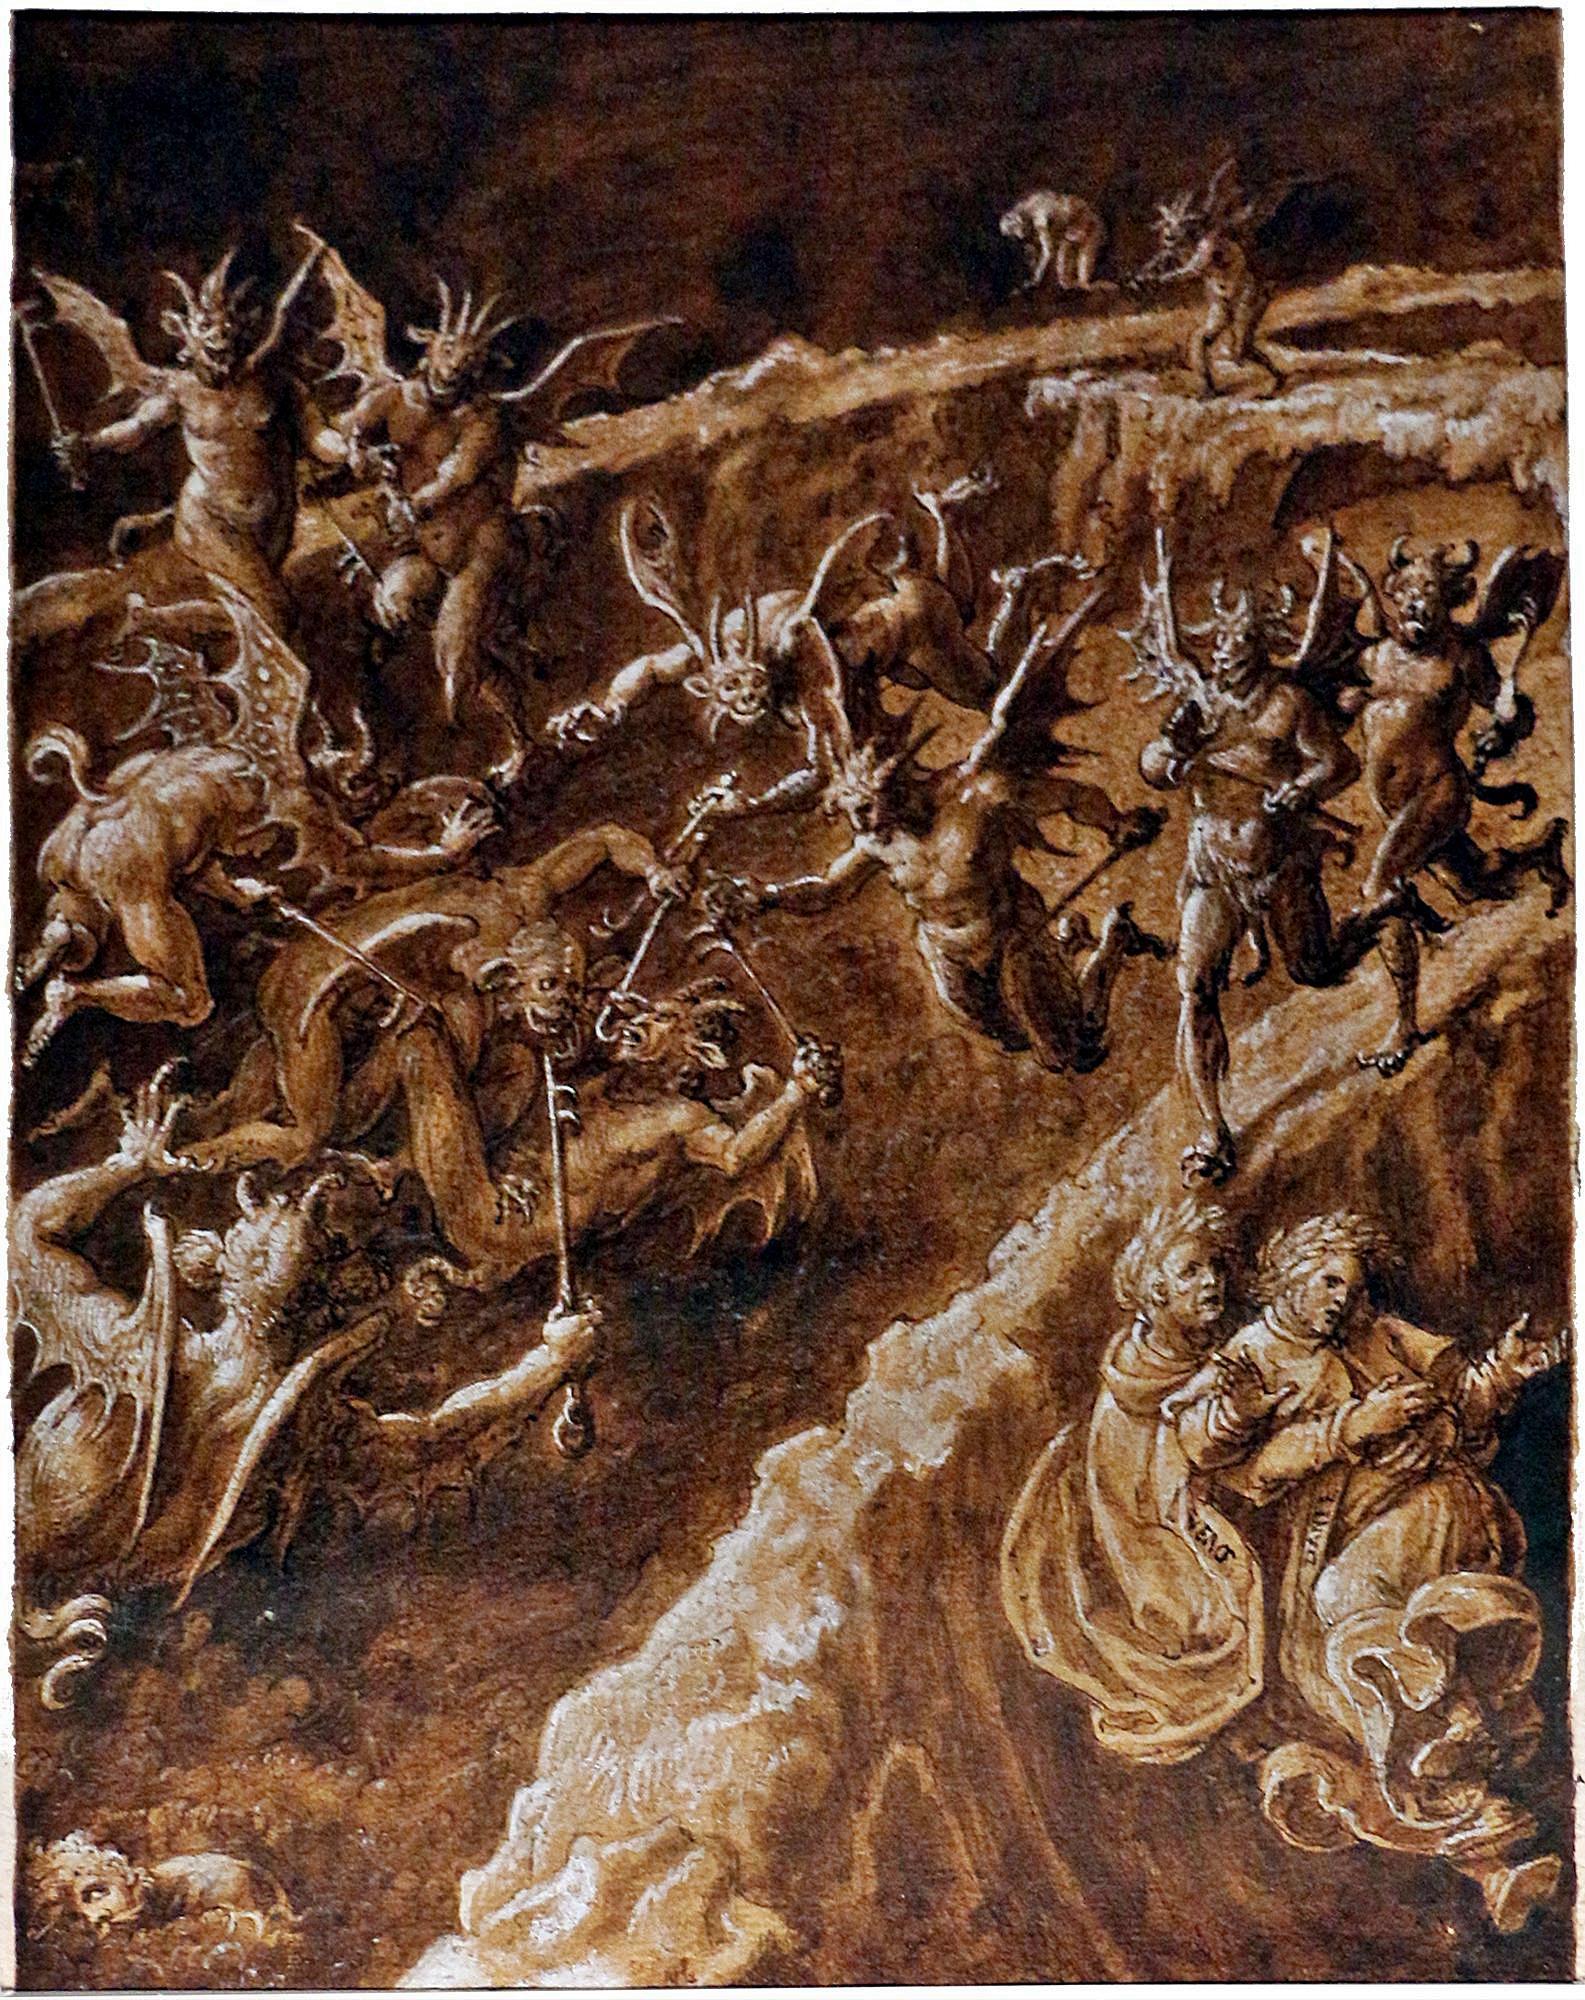 Giovanni Stradano, I barattieri. Inferno, Canto XXI.